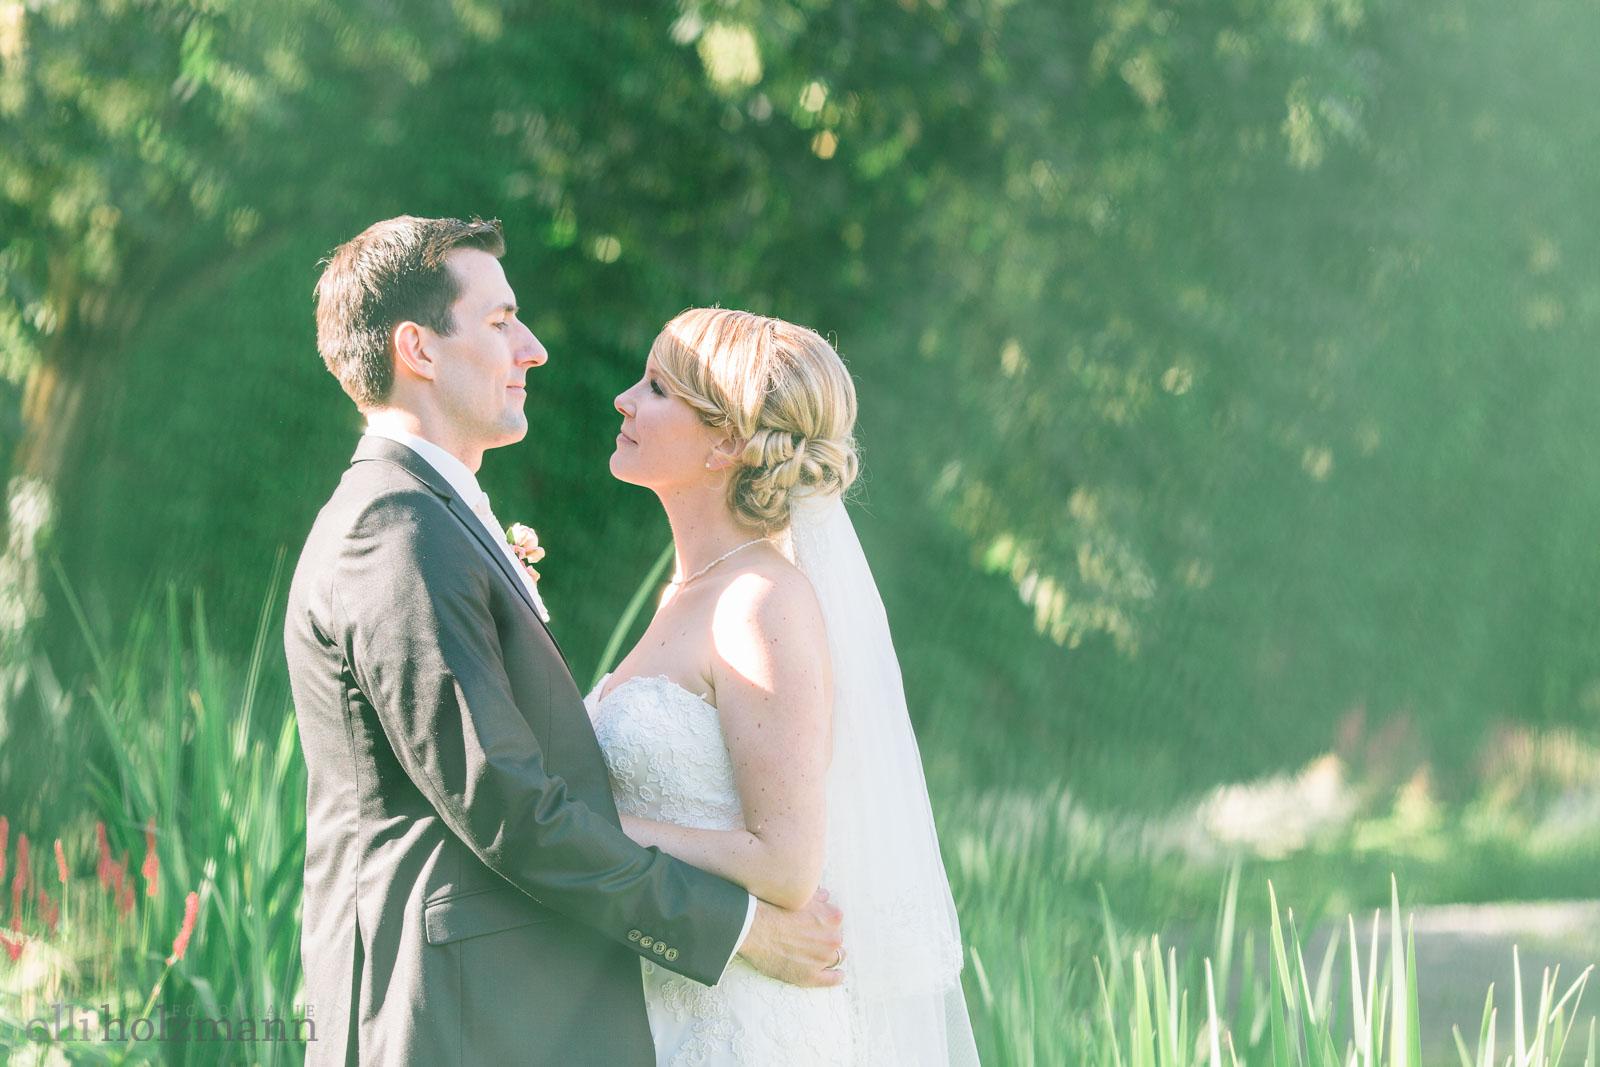 Hochzeitsfotograf nrw-78.jpg